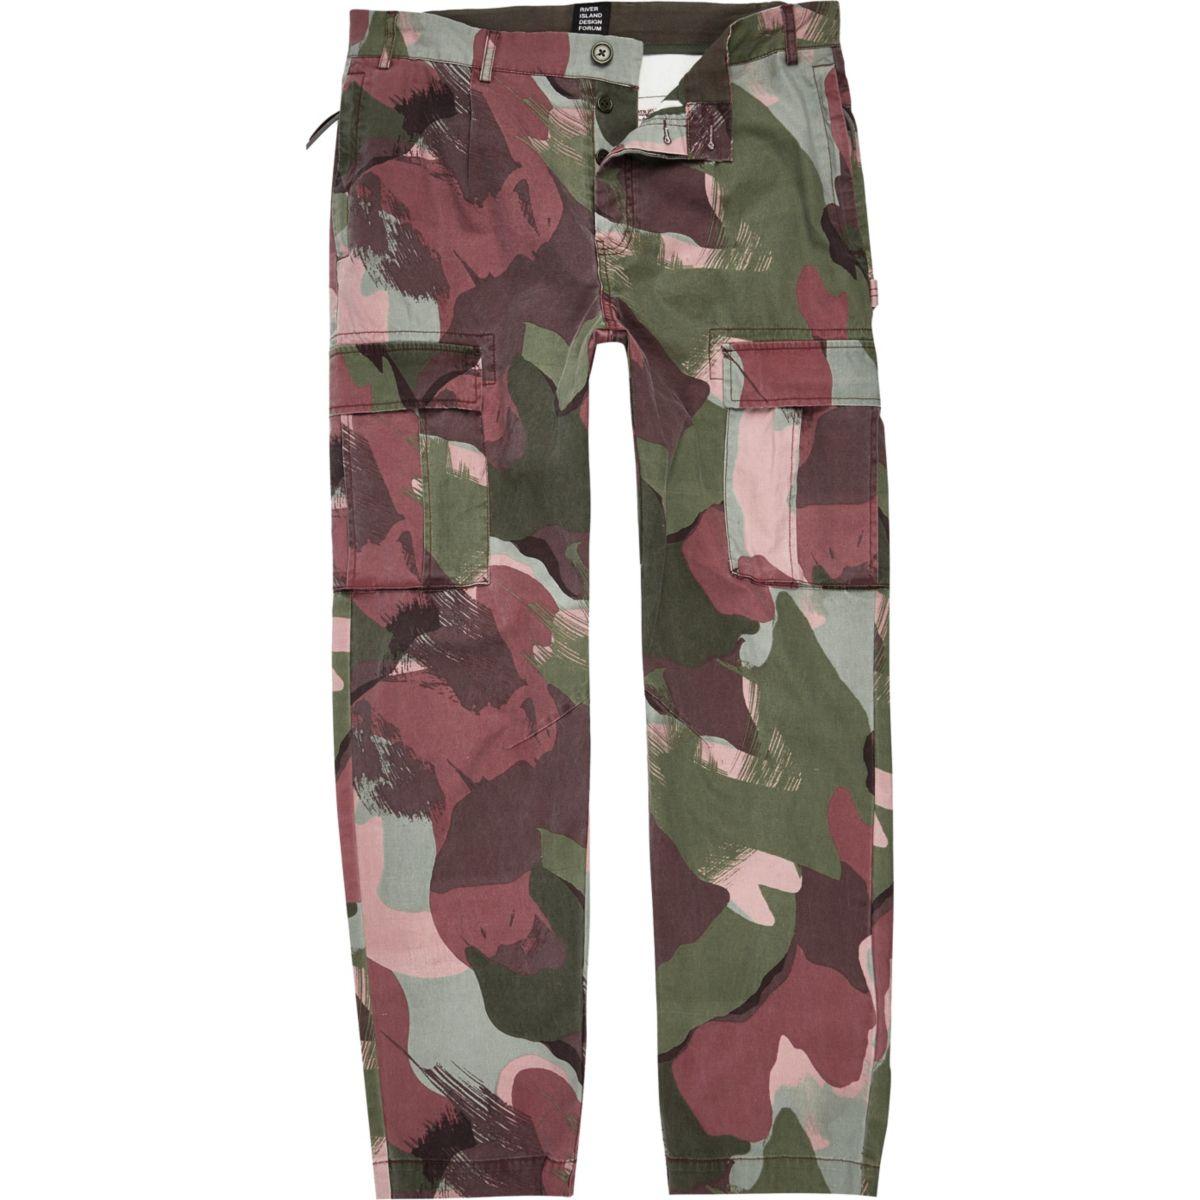 Khaki Green Design Forum Camo Cargo Pants by River Island